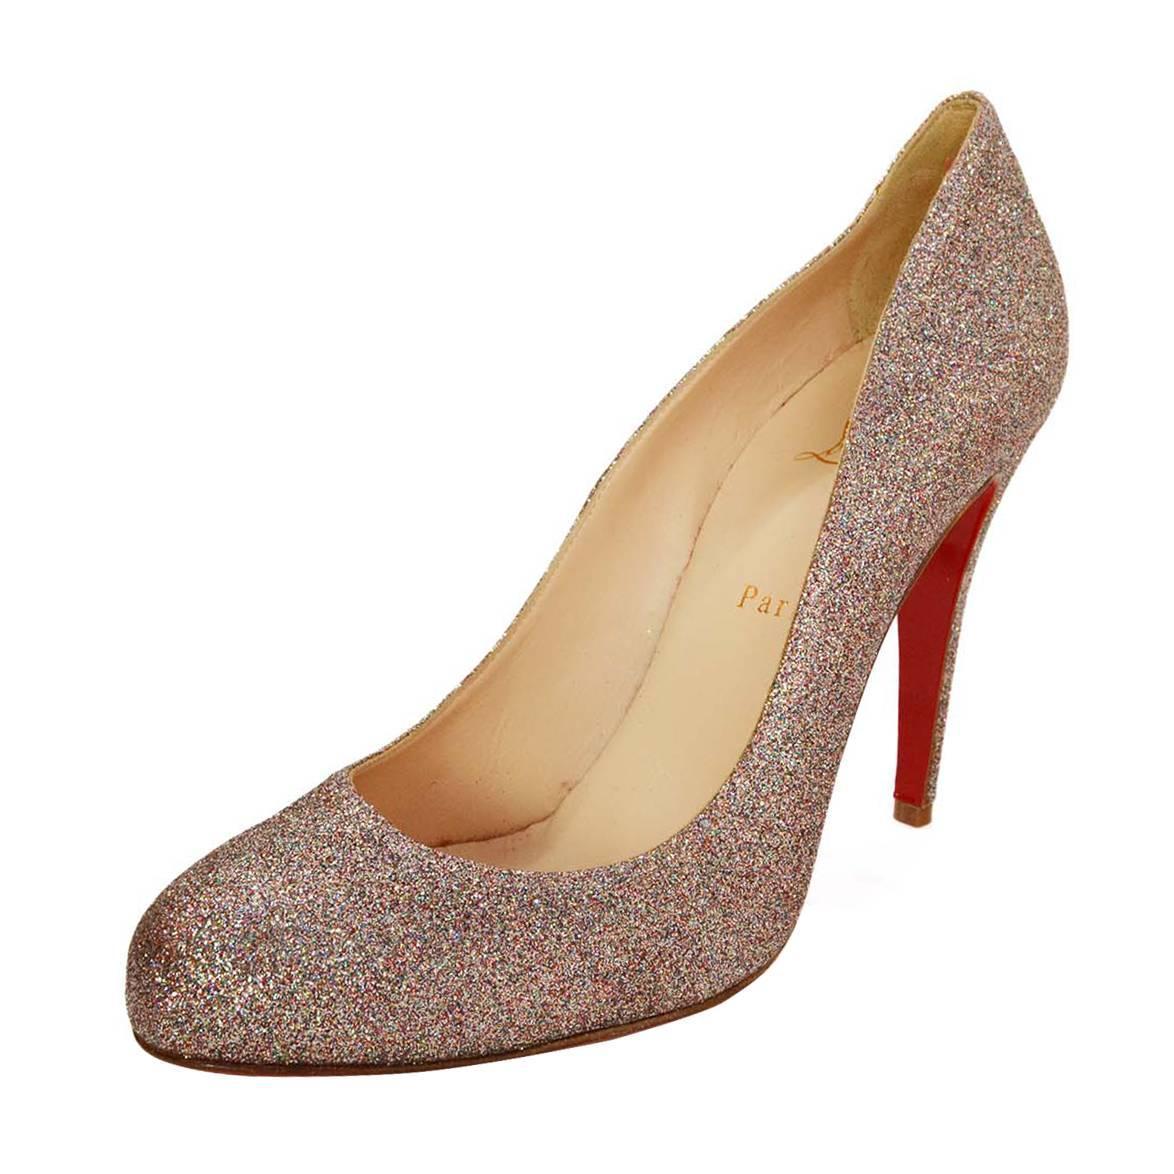 inexpensive clutch purses - christian louboutin glitter fifi pumps, mens red bottom tennis shoes